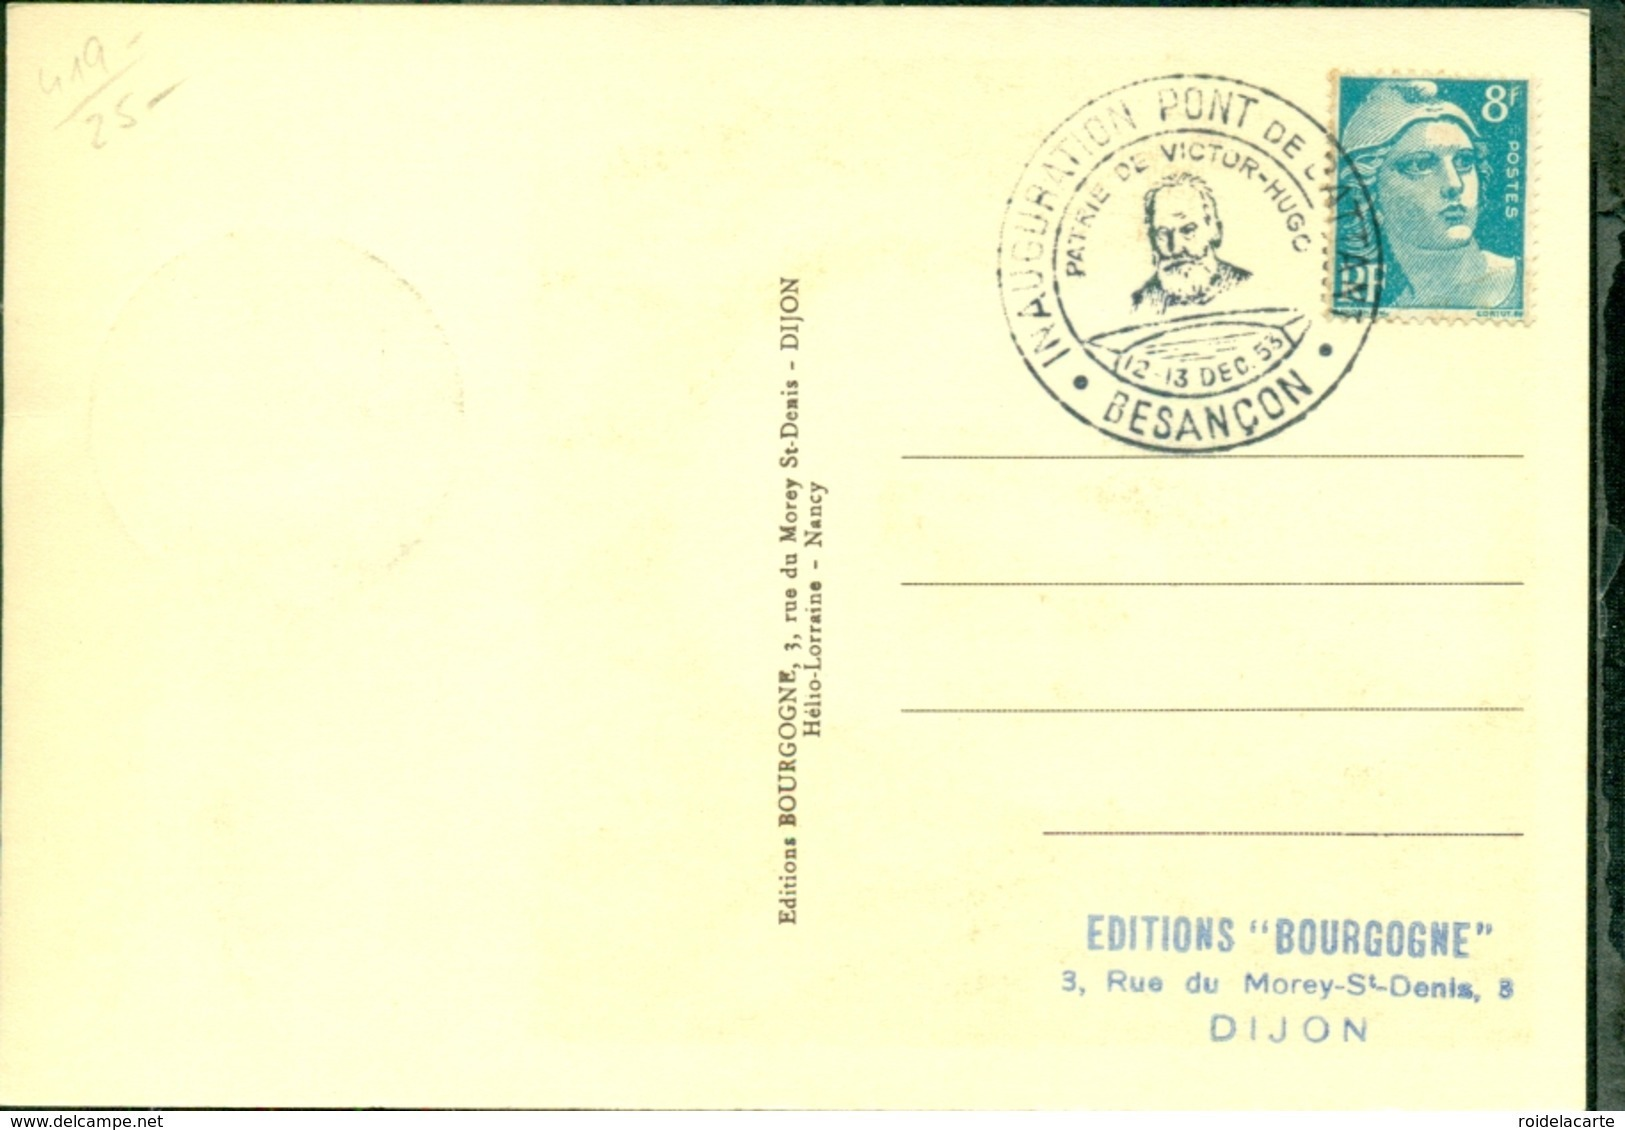 CM-Carte Maximum Card # France-1938 #Victor Hugo,poète,Dichter (Yvert 383 ) # Obl. Illustr. Besancon 12.12.1953 - 1930-39